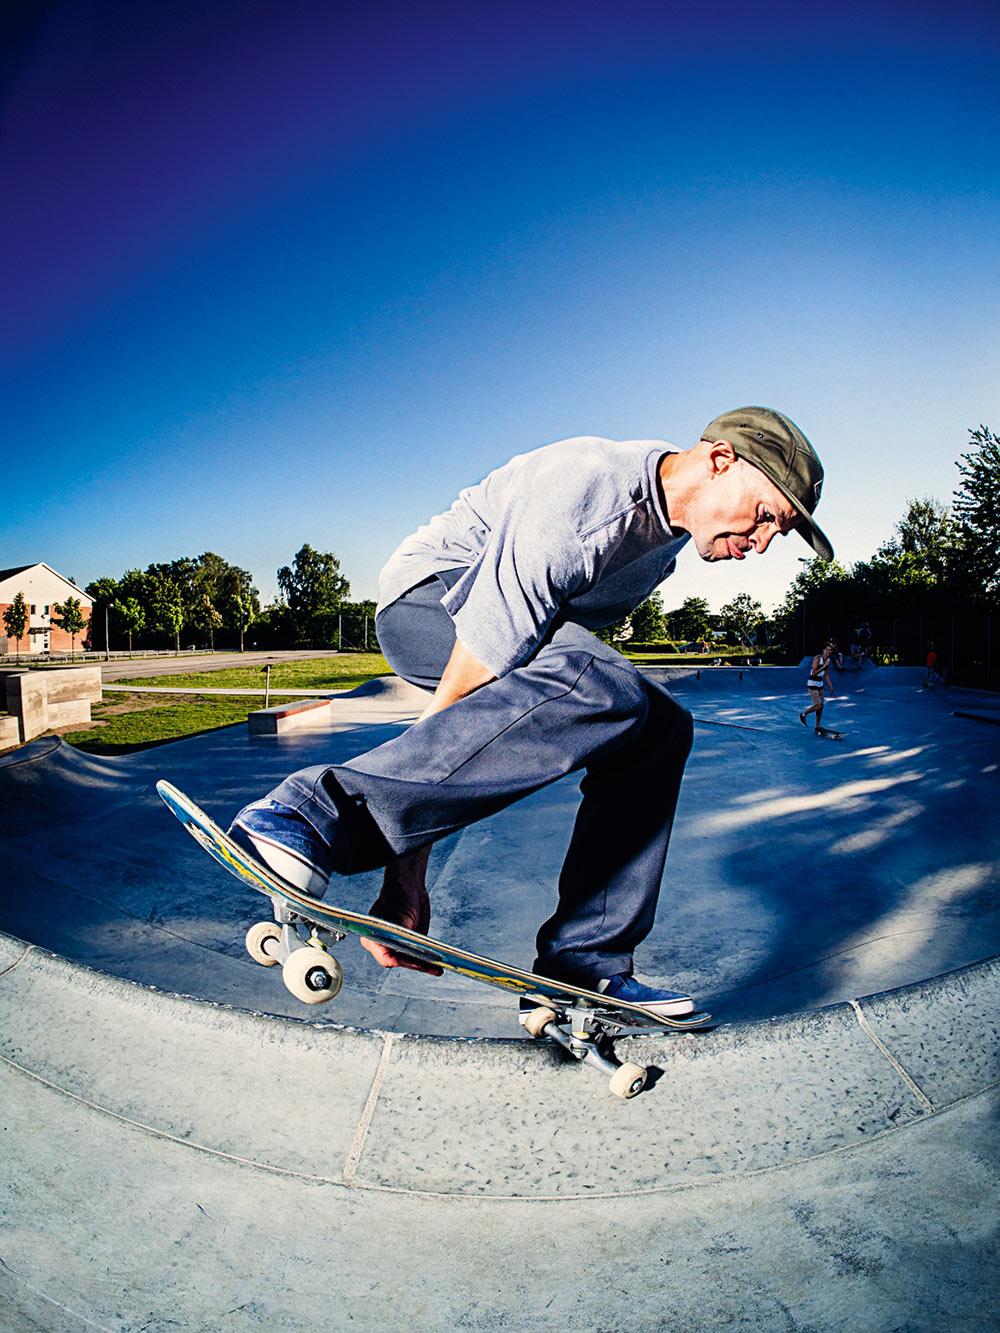 Åkarp Skatepark